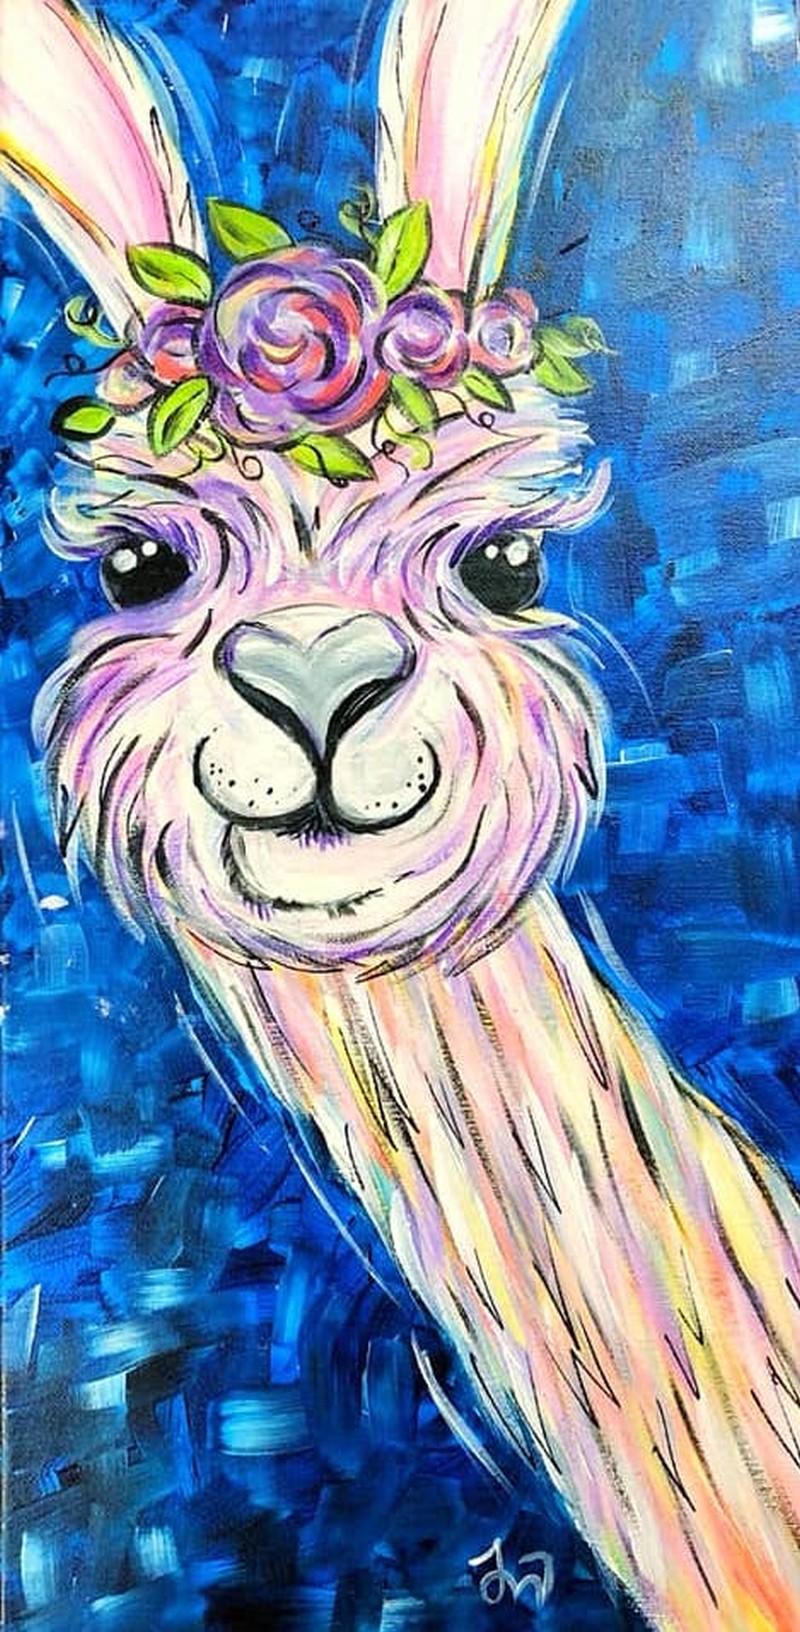 Lilac the Llama